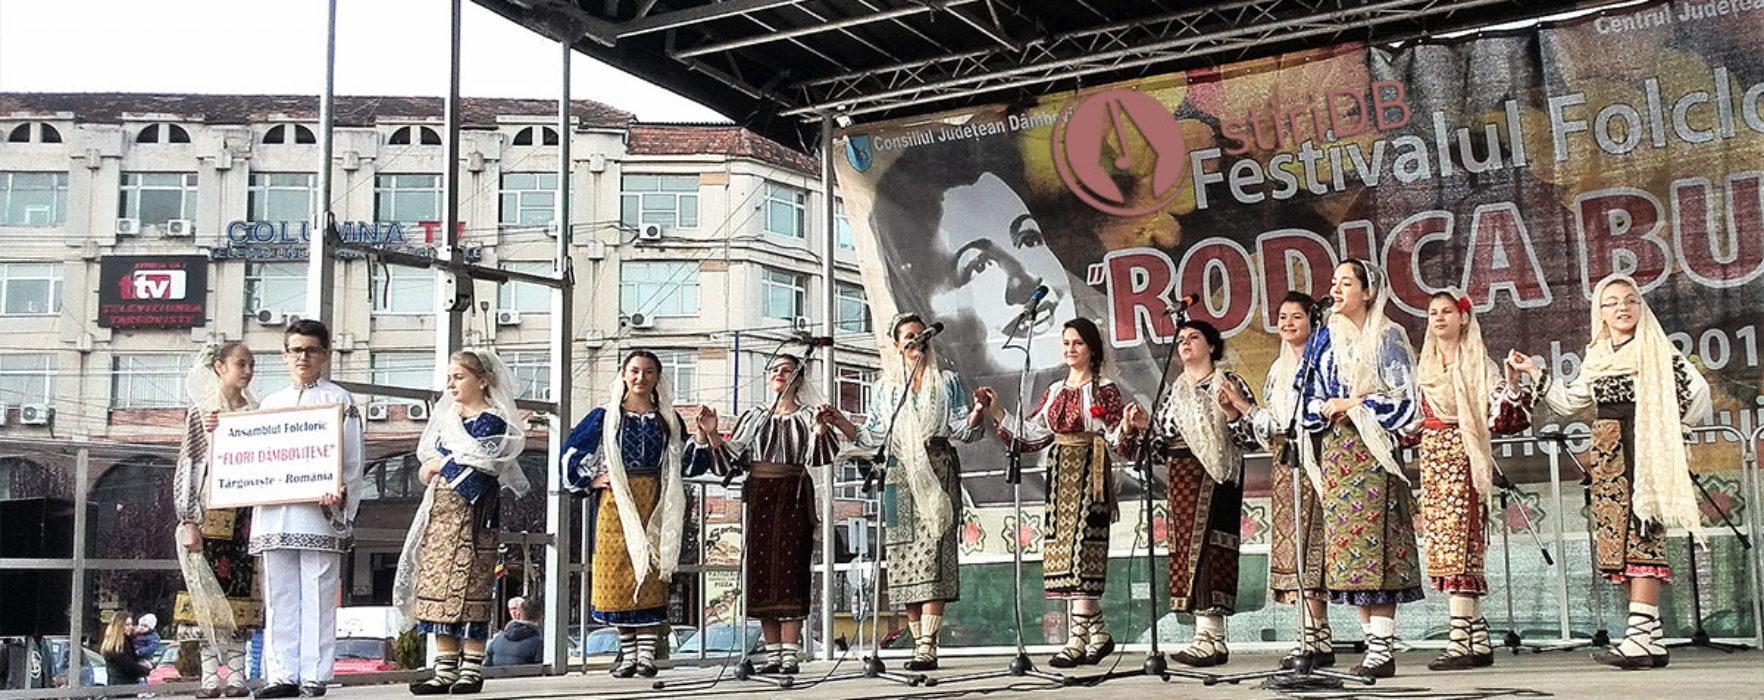 "Festivalul ""Rodica Bujor"", la Târgovişte"